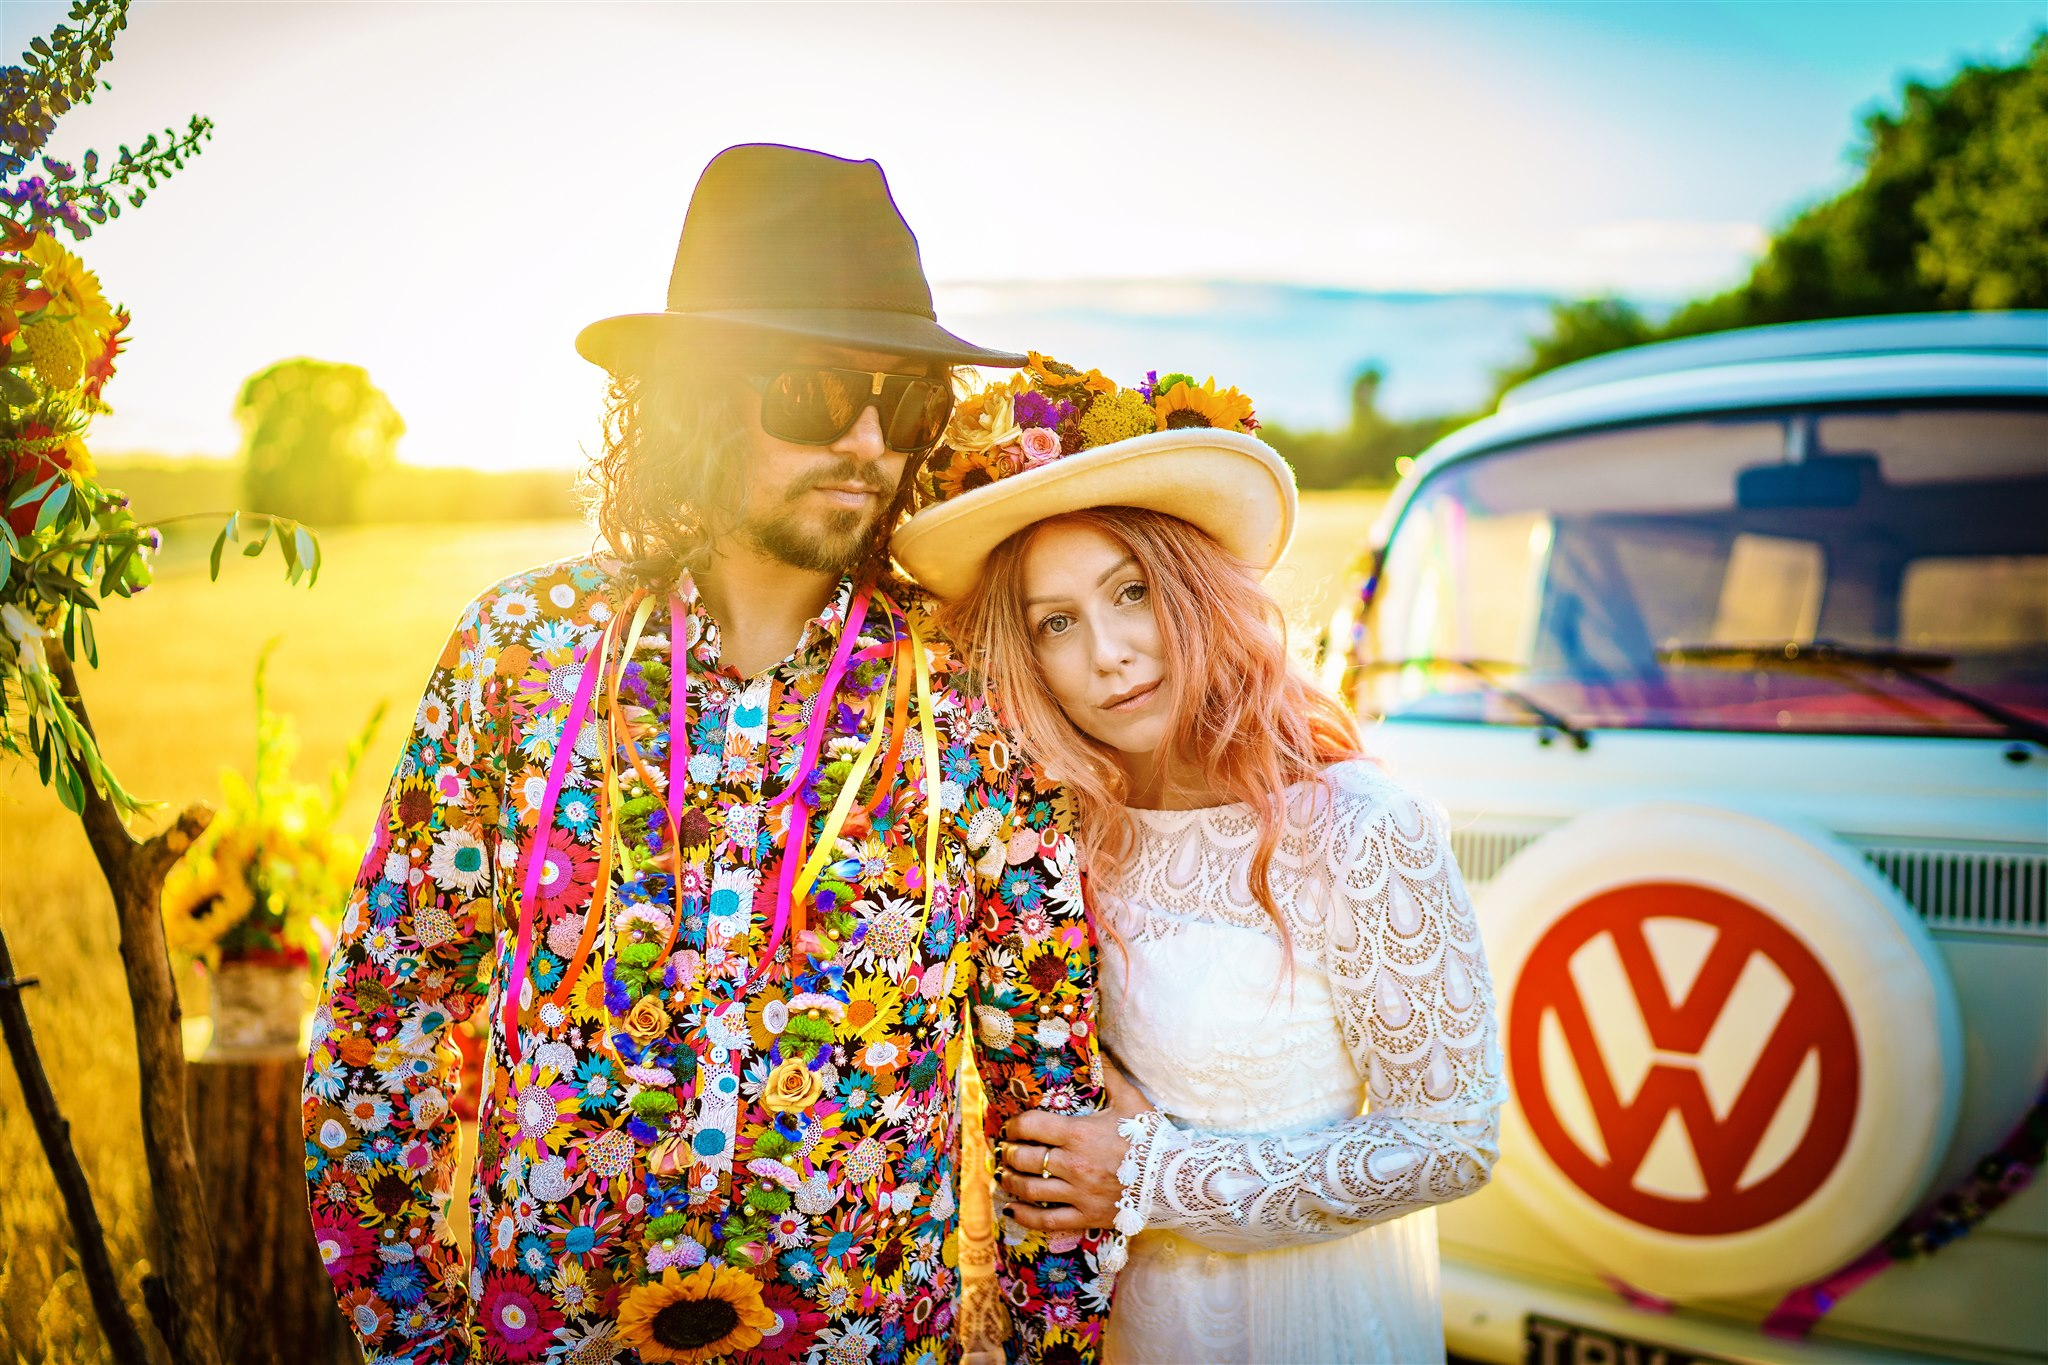 colourful bohemian wedding - 70s wedding - campervan wedding - hippie wedding - free spirited wedding